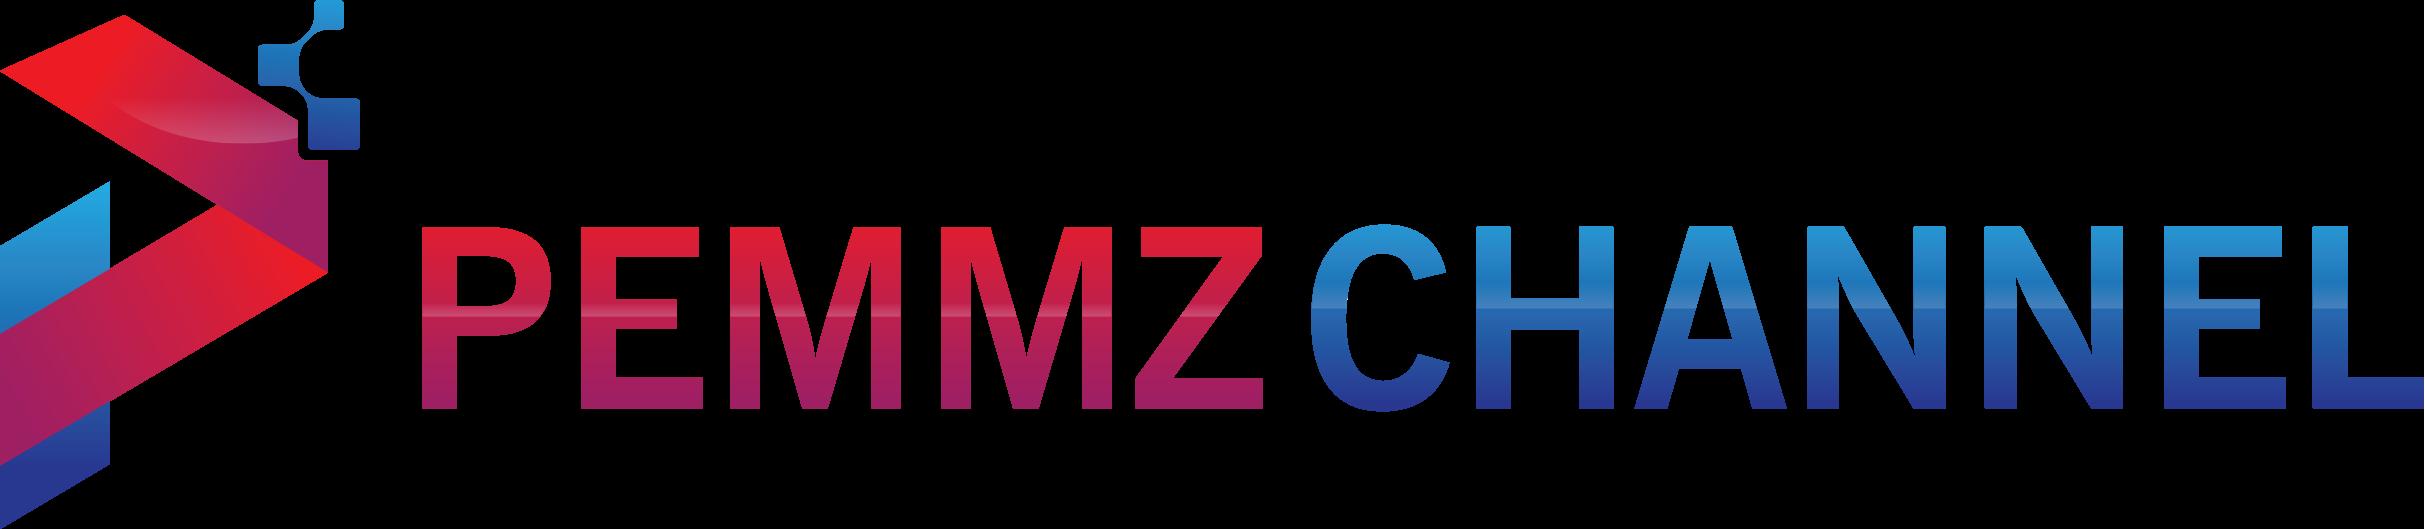 Pemmzchannel.com